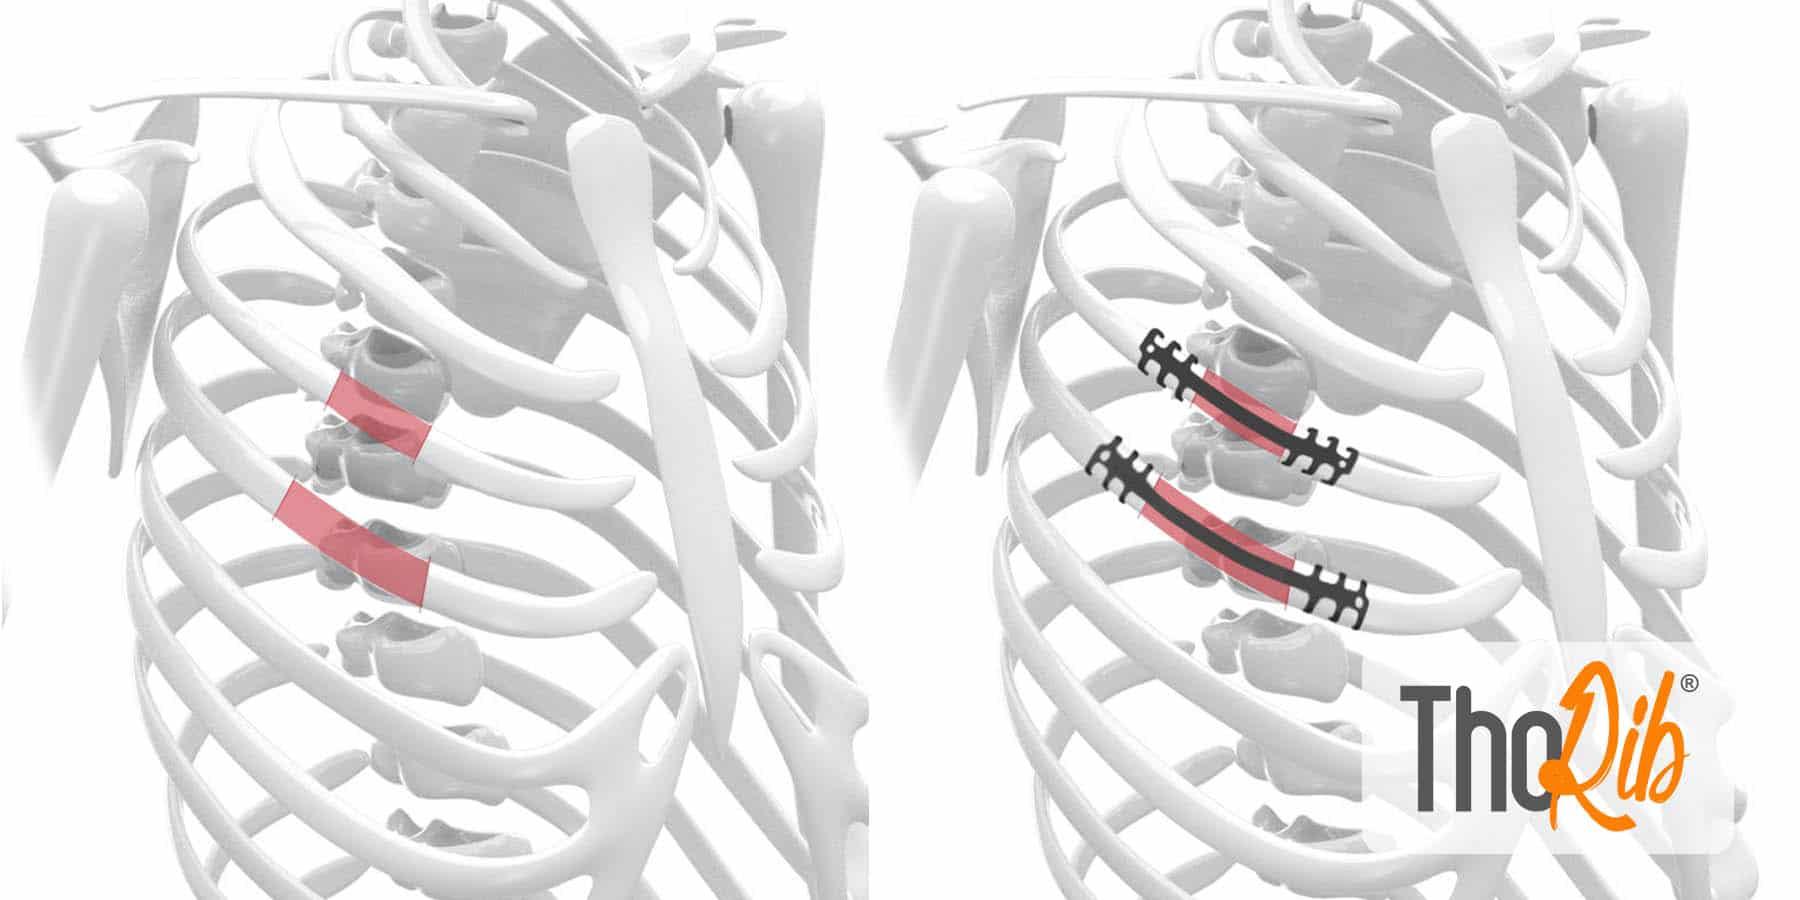 neuro-france-implants-thorib5